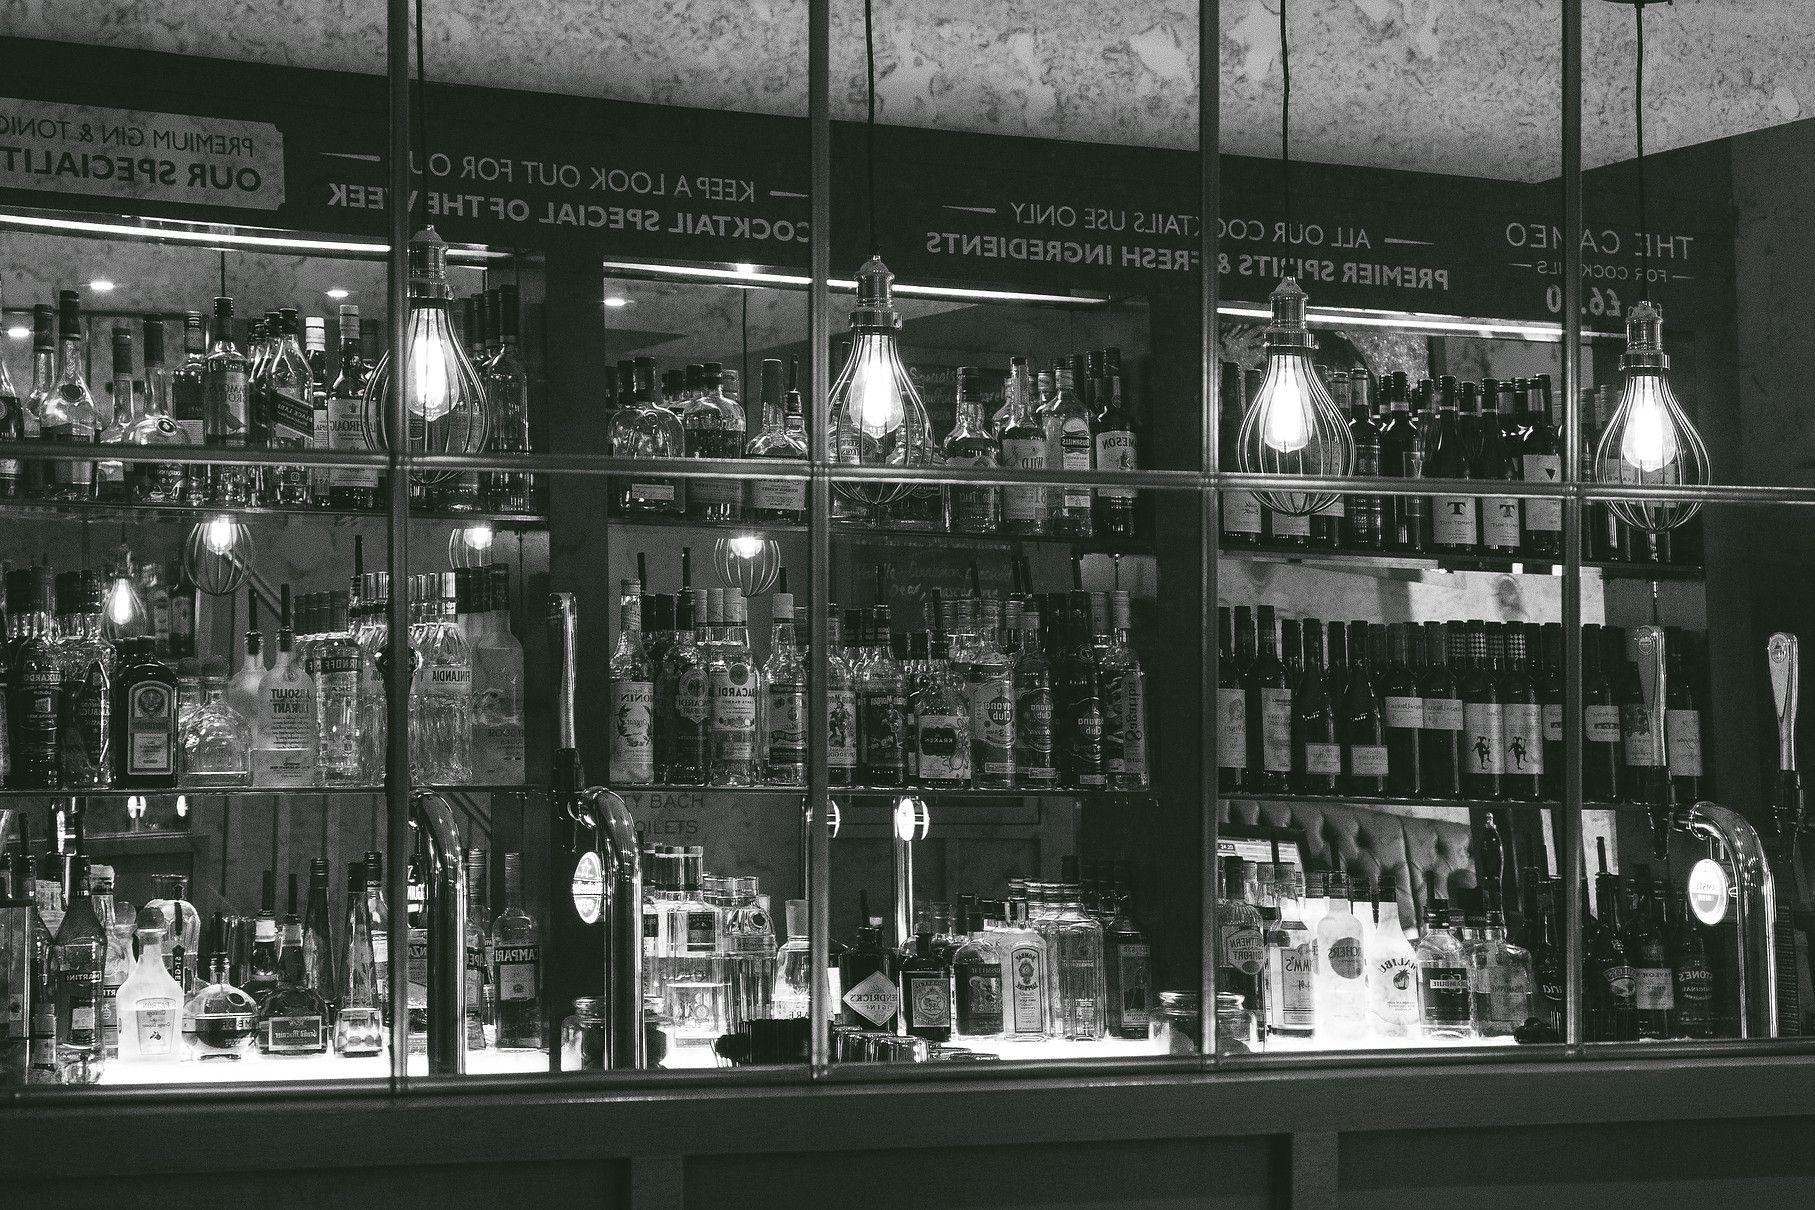 Cameo Club Cardiff #Bistro #Dining #InteriorInspiration #Bar #AgedMirror #Vintage